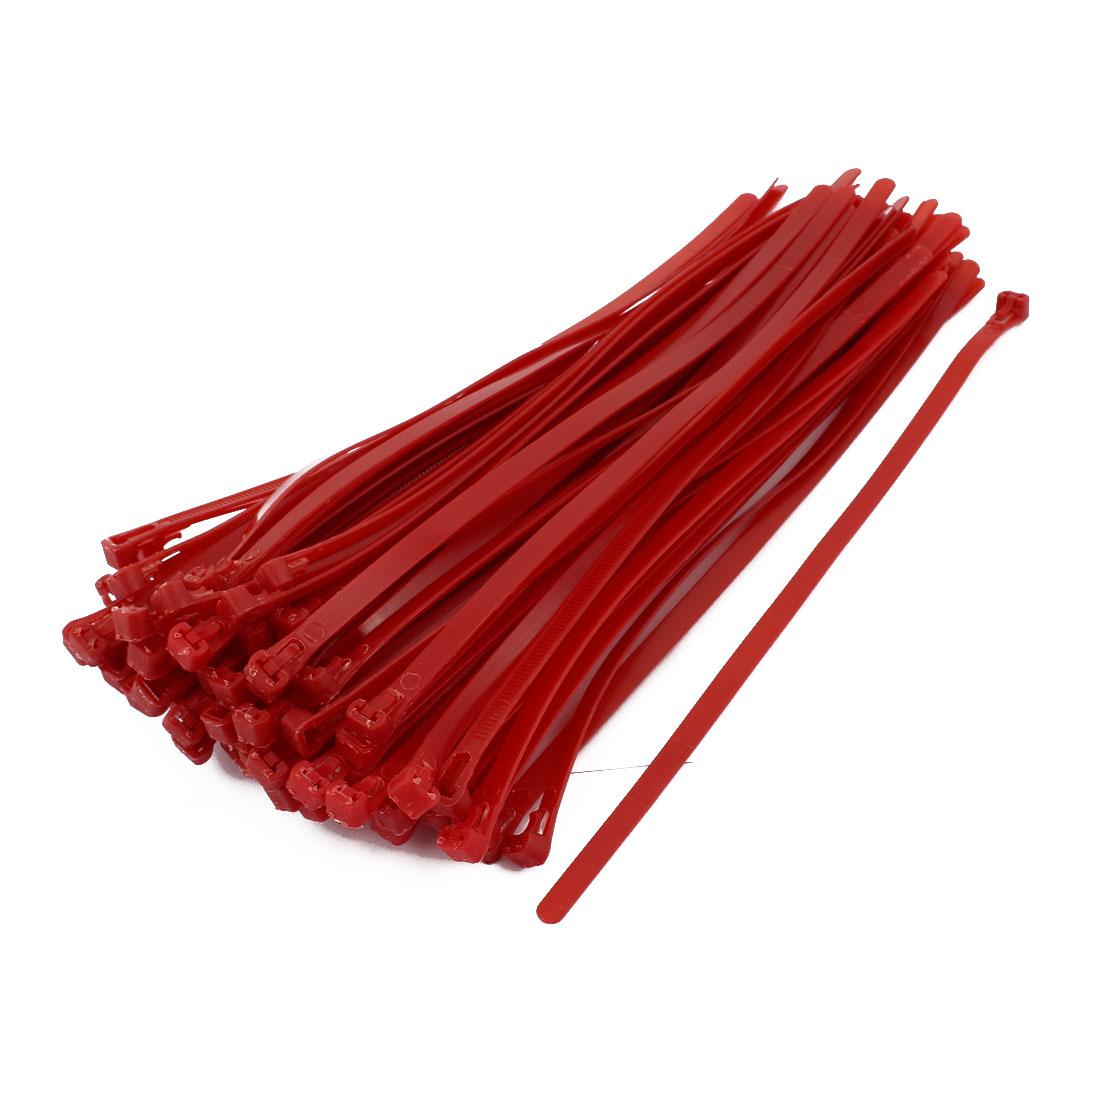 100Pcs 8x300mm Nylon Wire Tie Fastener Strap Adjustable Reusable Hook Loop